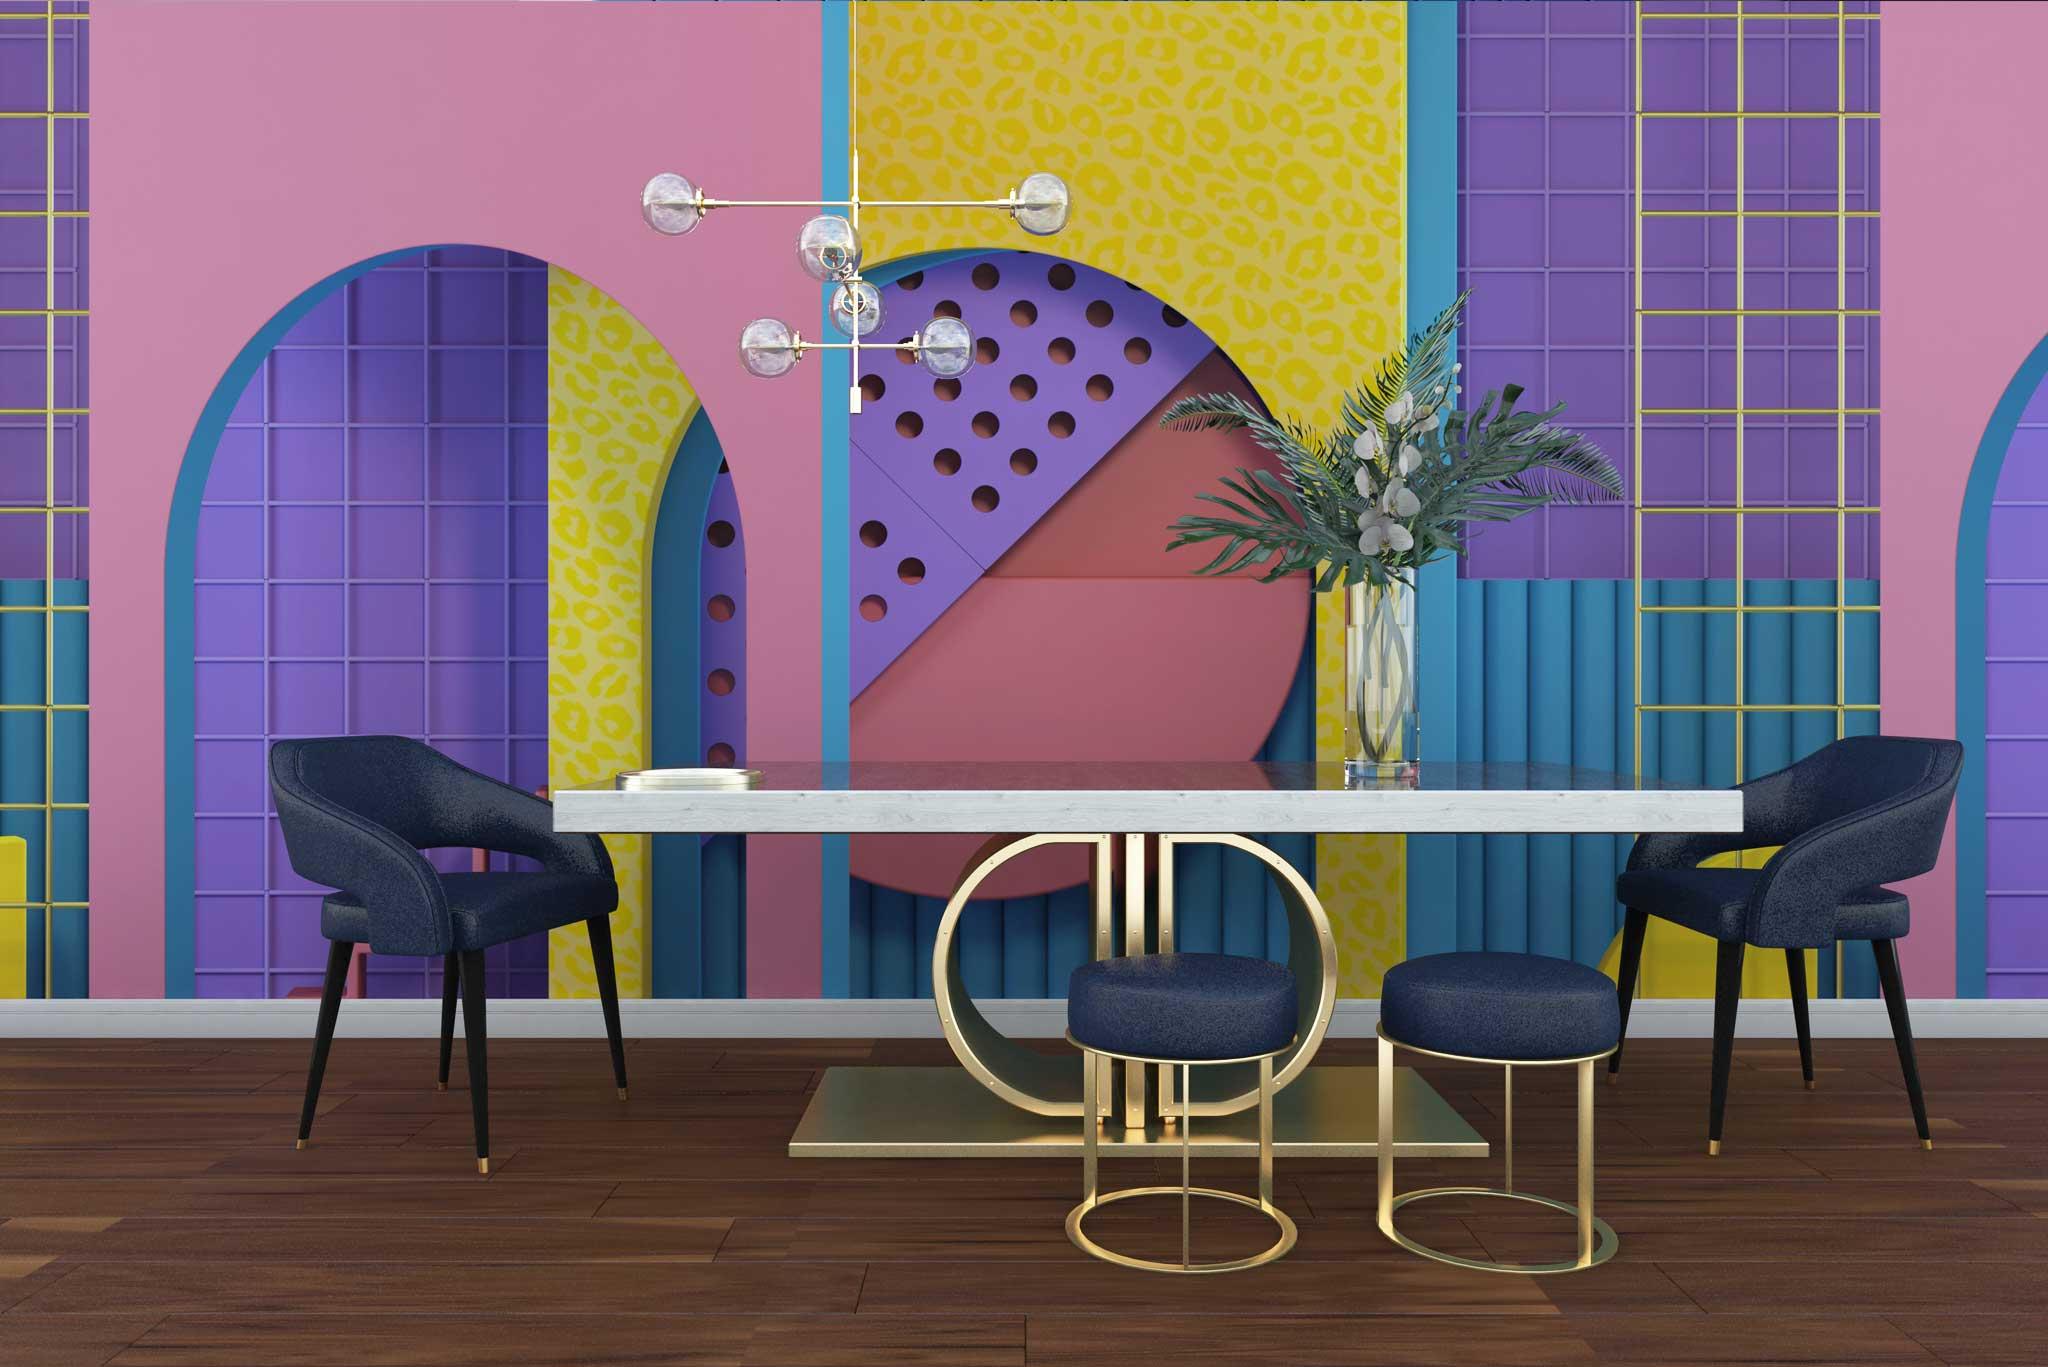 tapet-fototapet-personalizat-comanda-bucuresti-model-abstract-volume-multicolor-perete-lux-special